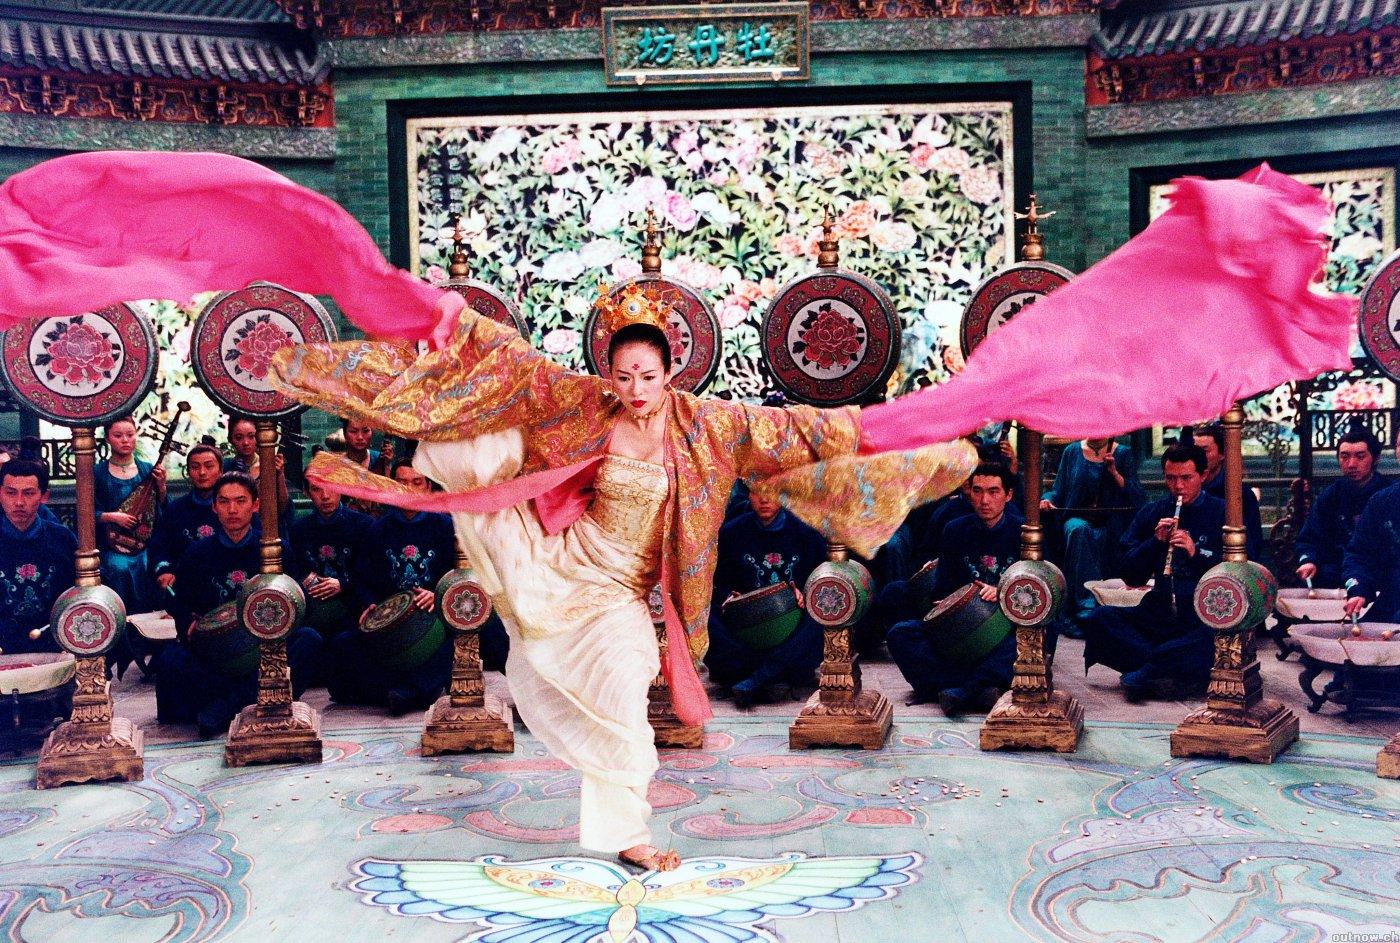 http://4.bp.blogspot.com/-8bRAS7uChu0/TiHKKpAwVRI/AAAAAAAAAPM/f3rdKoP8ARU/s1600/house_of_flying_daggers34.jpg